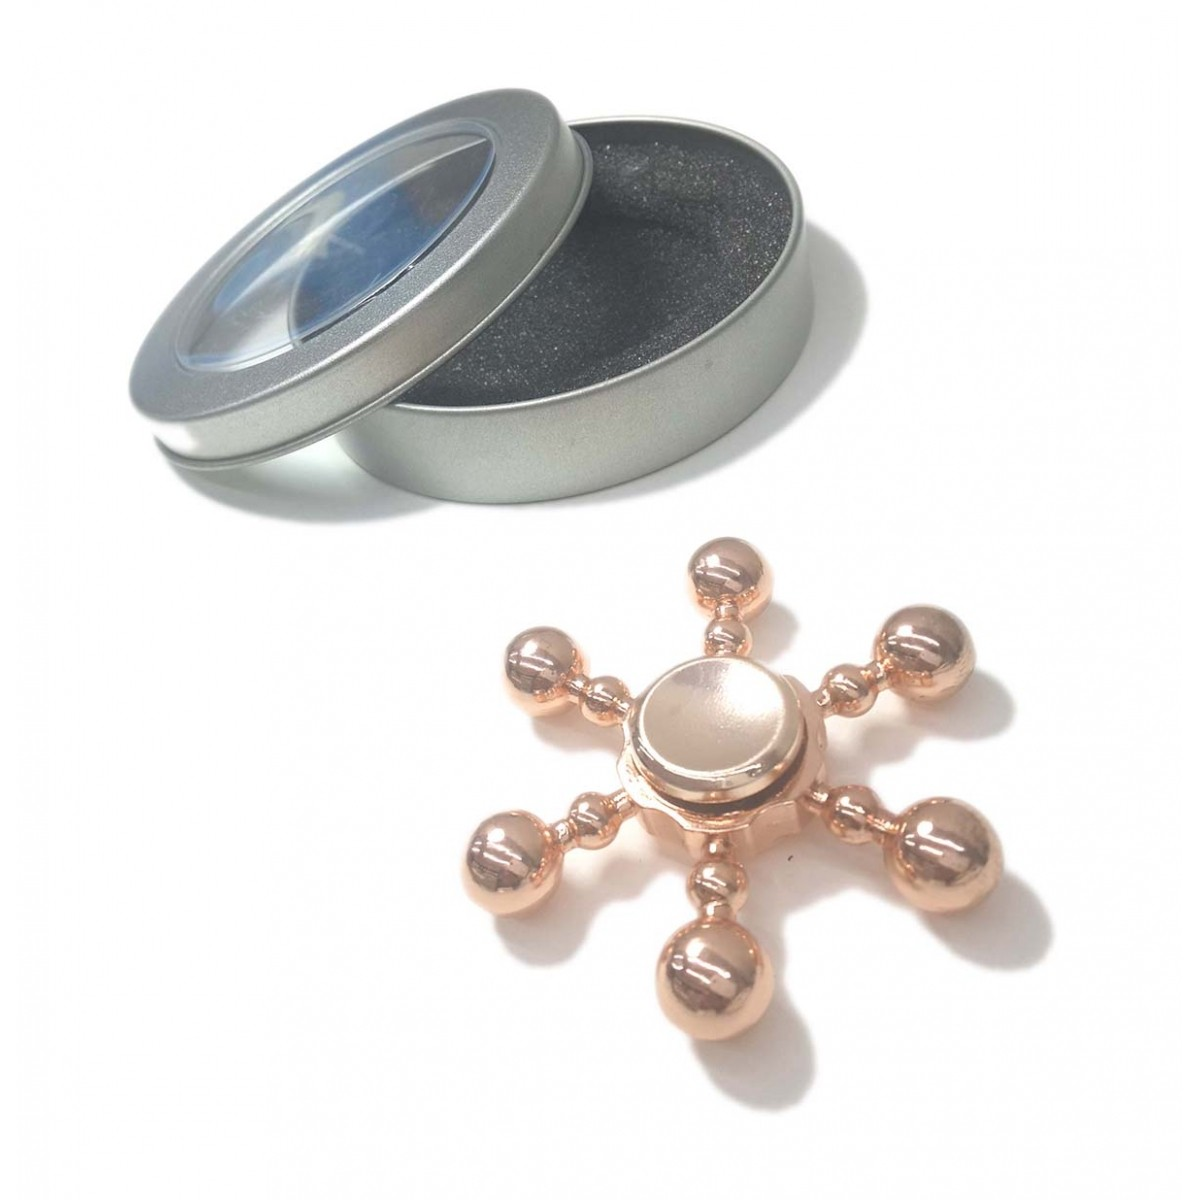 Hand Spinner Fidget De Metal Leme Cobre Mania Gira Ansiedade Anti Estresse (bsl-gira-10)